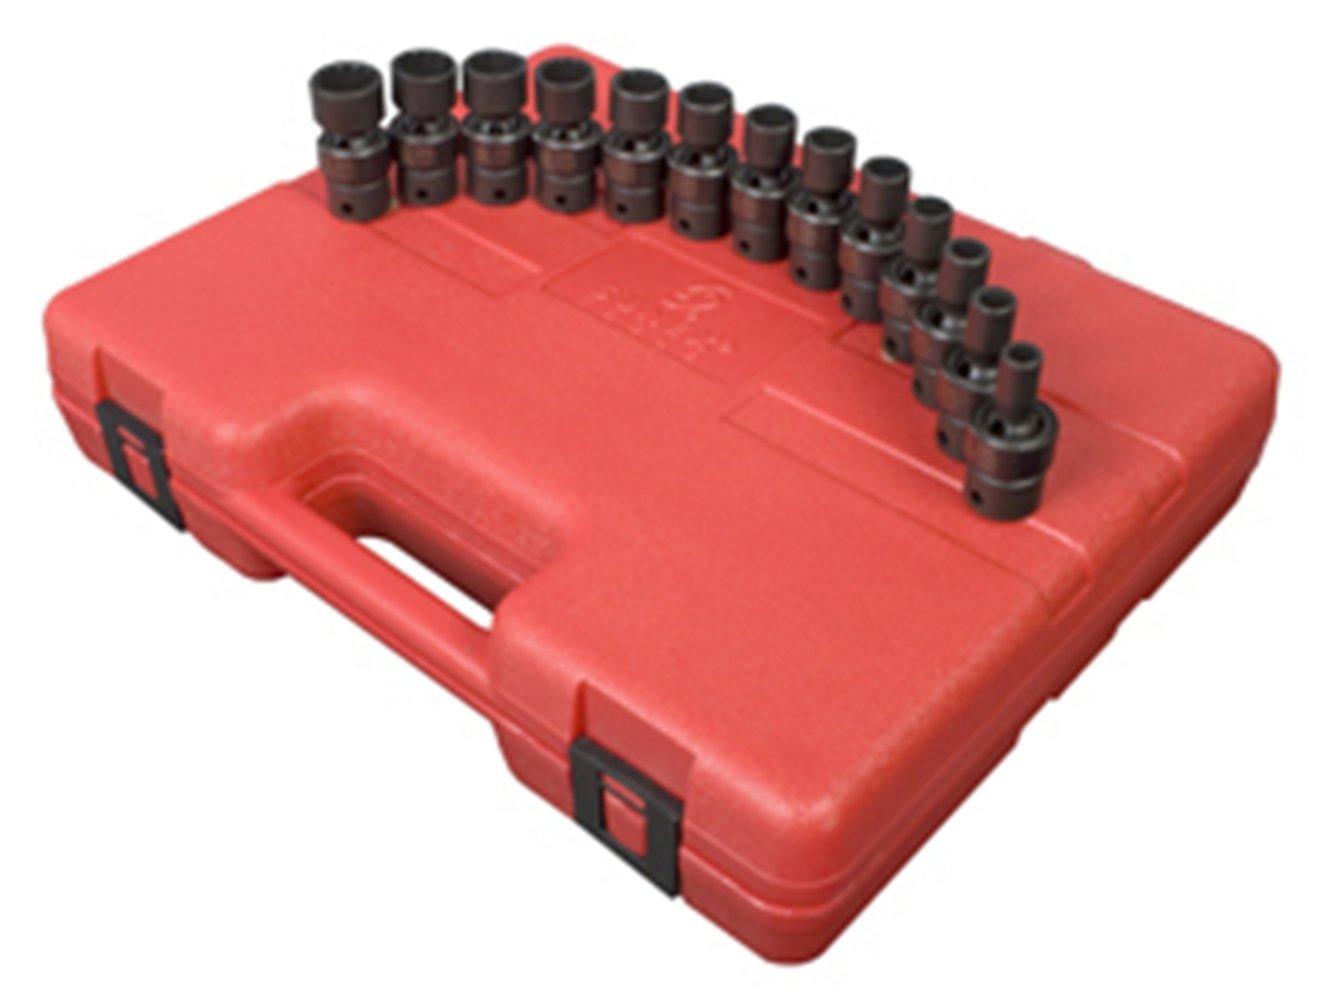 Sunex 3691 3/8-Inch Drive 12-Point Standard Length Metric Universal Impact Socket Set, 13-Piece Sunex International